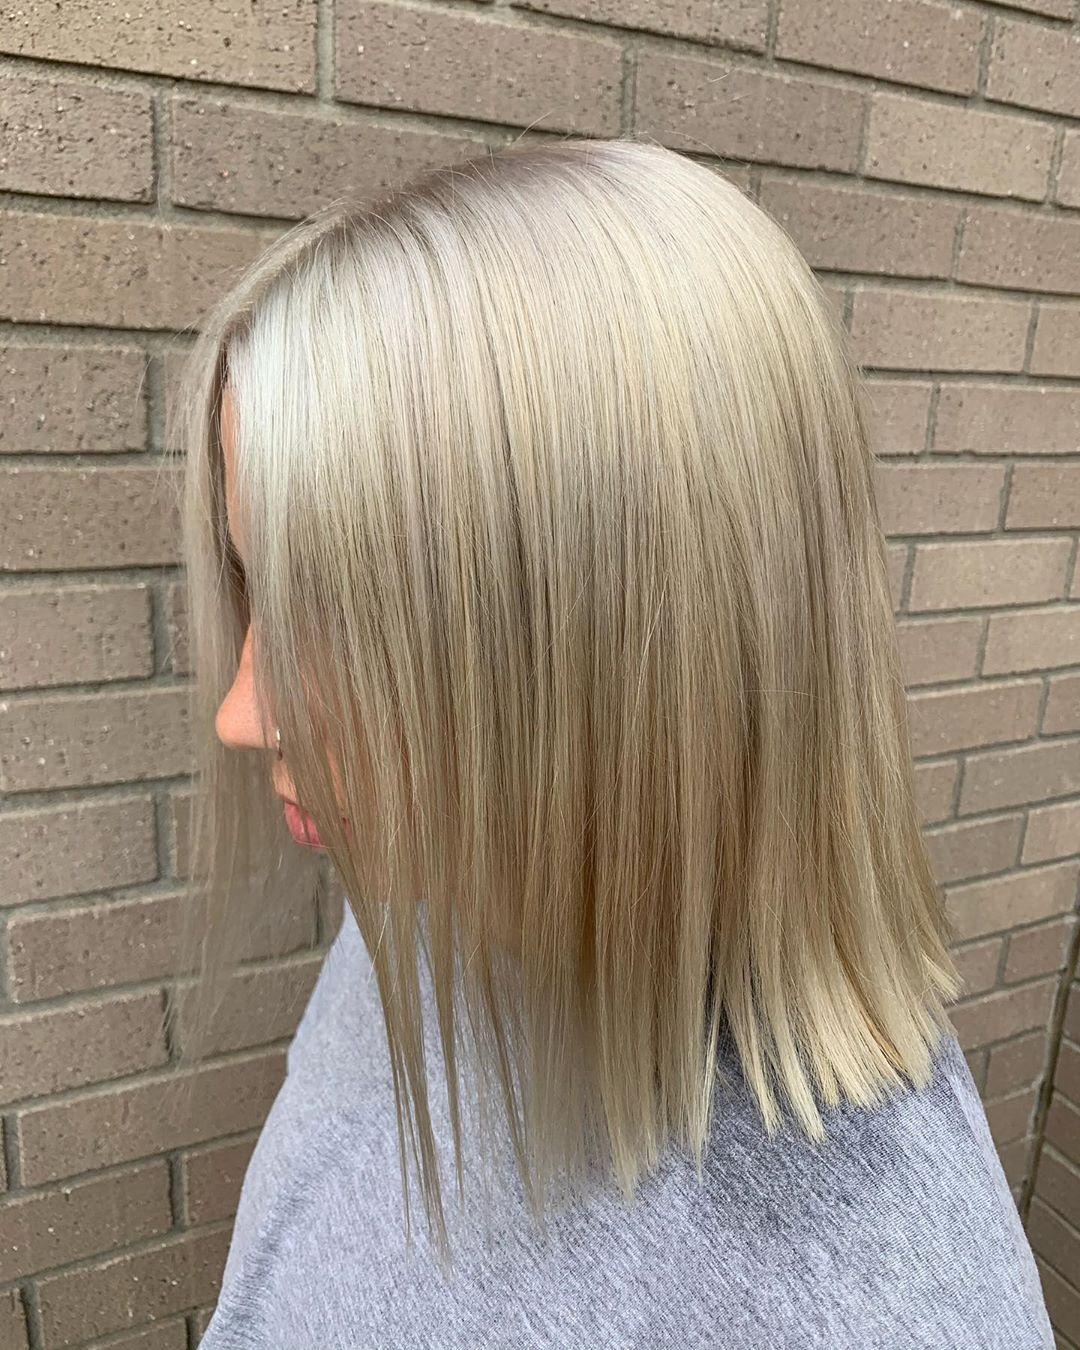 👀 . . . . . . . . #livedin #livedinblonde #livedinhair #livedincolor #redken #redkenshadeseq #redkenobsessed #redkencolor #redkenready #redkenrecipe #shadeseq #blonde #blondehair #platinumblonde #platinumhair #icyblonde #hairtransformation #beforeandafter #hairofinstagram #hairofig #hairofig #hairstyles #haircolor #hairstylist #hairgoals #hairpainters #hairbestie #haireducation #hairmakeover #hairbrained #stylistssupportingstylists